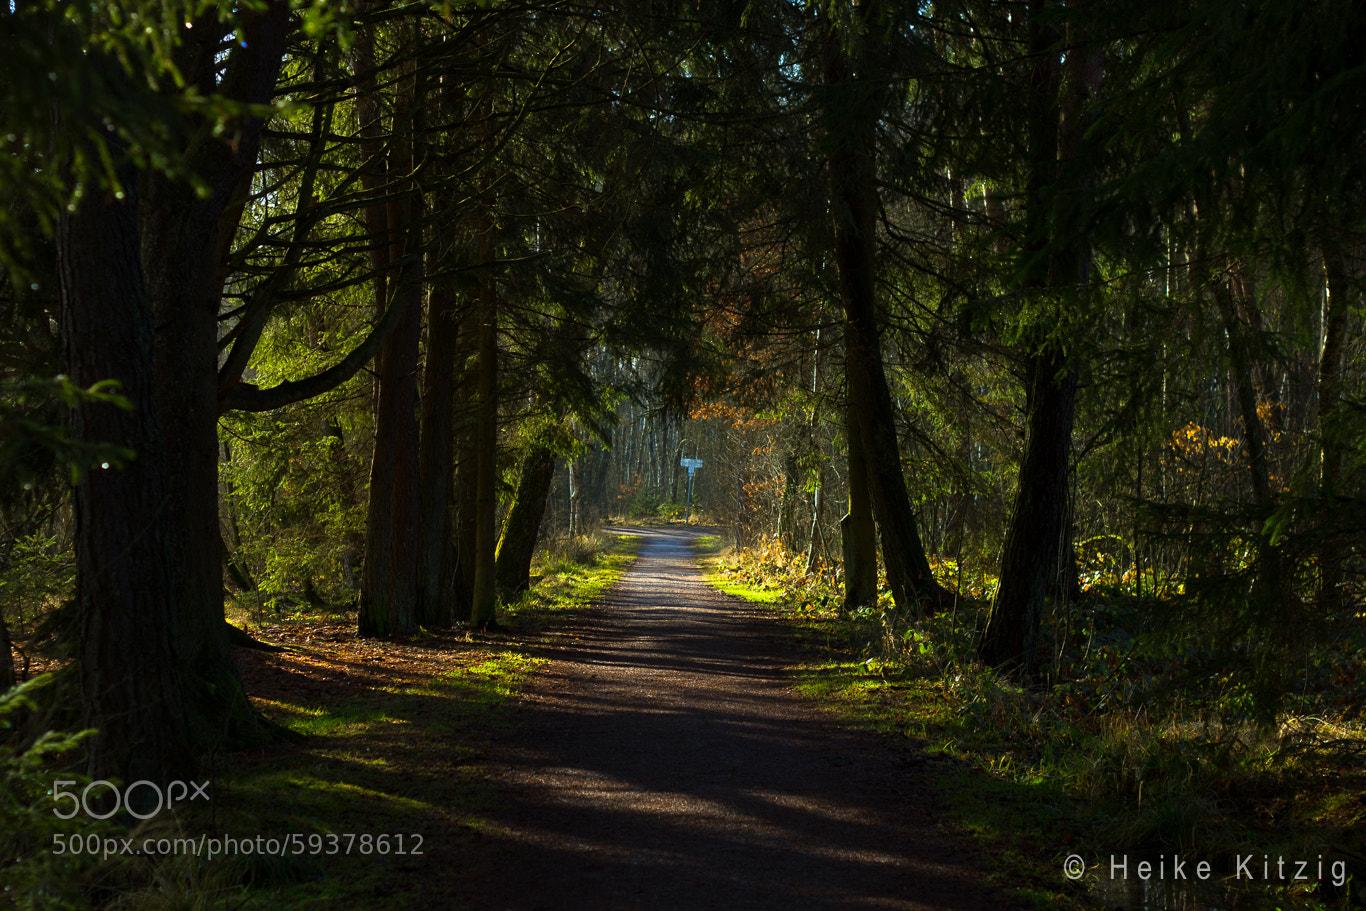 Photograph Way in Moss in Schwenningen Germany by Heike Kitzig on 500px